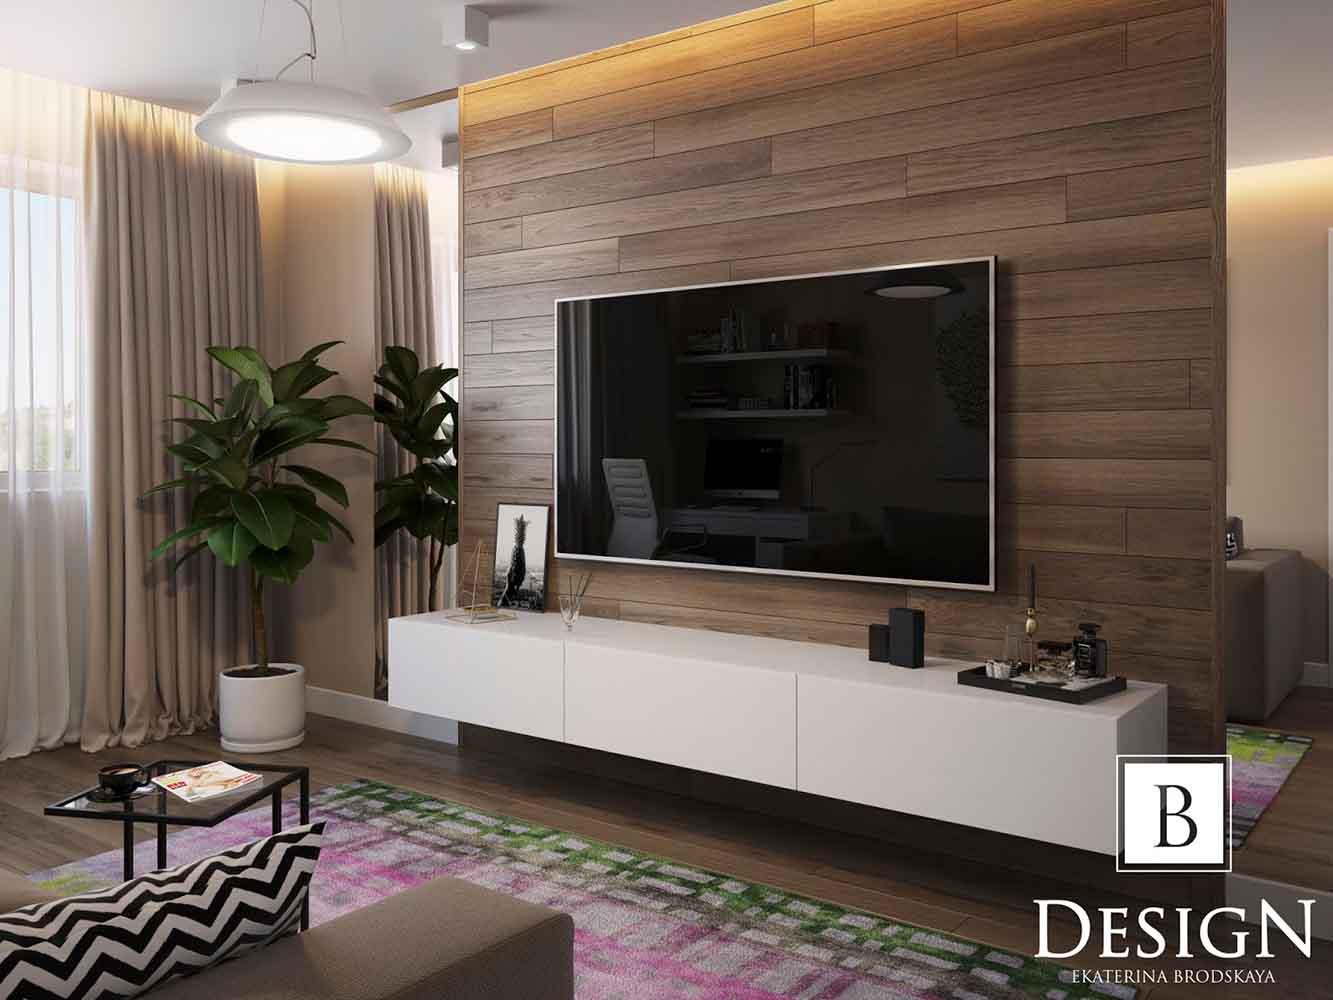 design project a flat in the podol by brodskaya 01 - Дизайн интерьера однокомнатной квартиры «Минимализм на Подоле» by Бродская